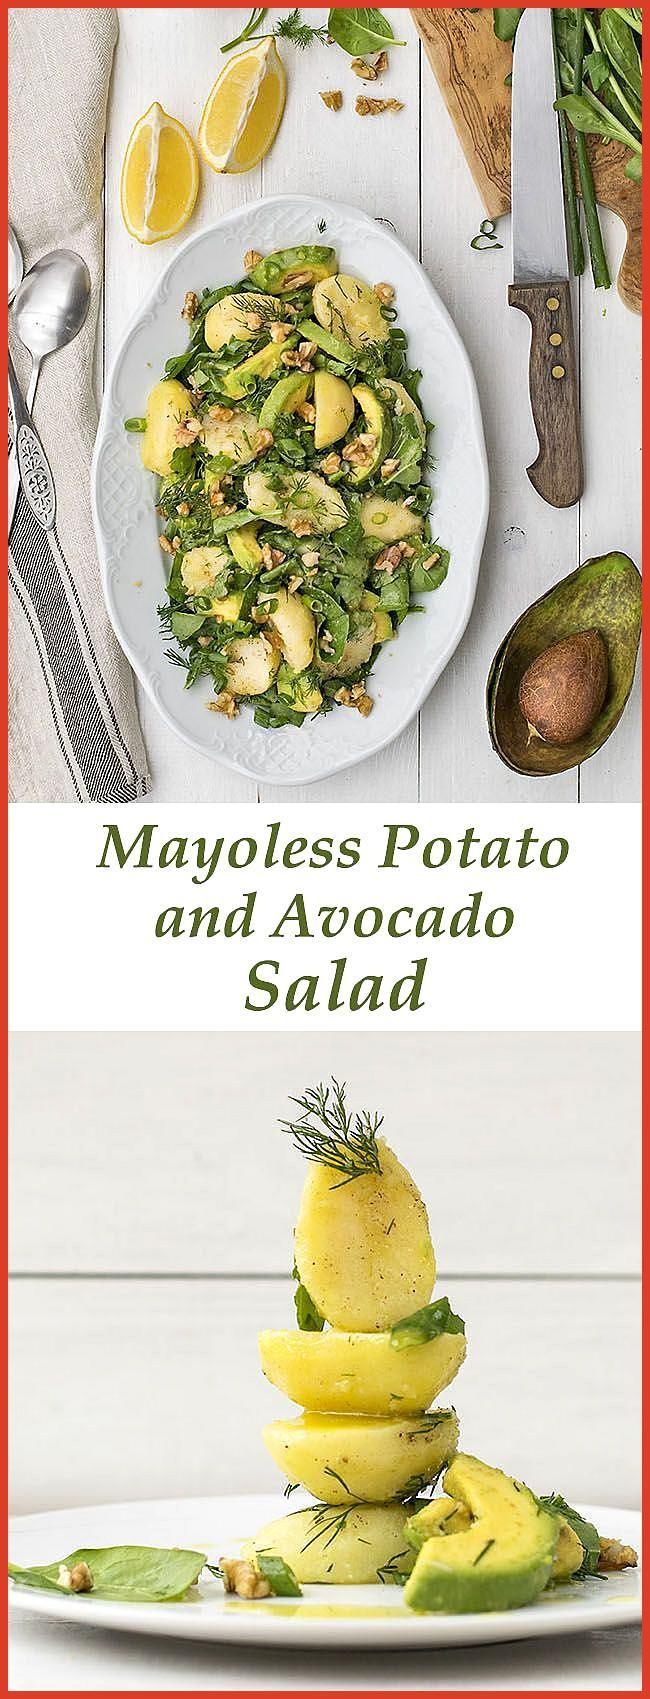 Mayo-less potato 038 avocado salad with greens This mayo-less potato and avocado salad is vegan glu